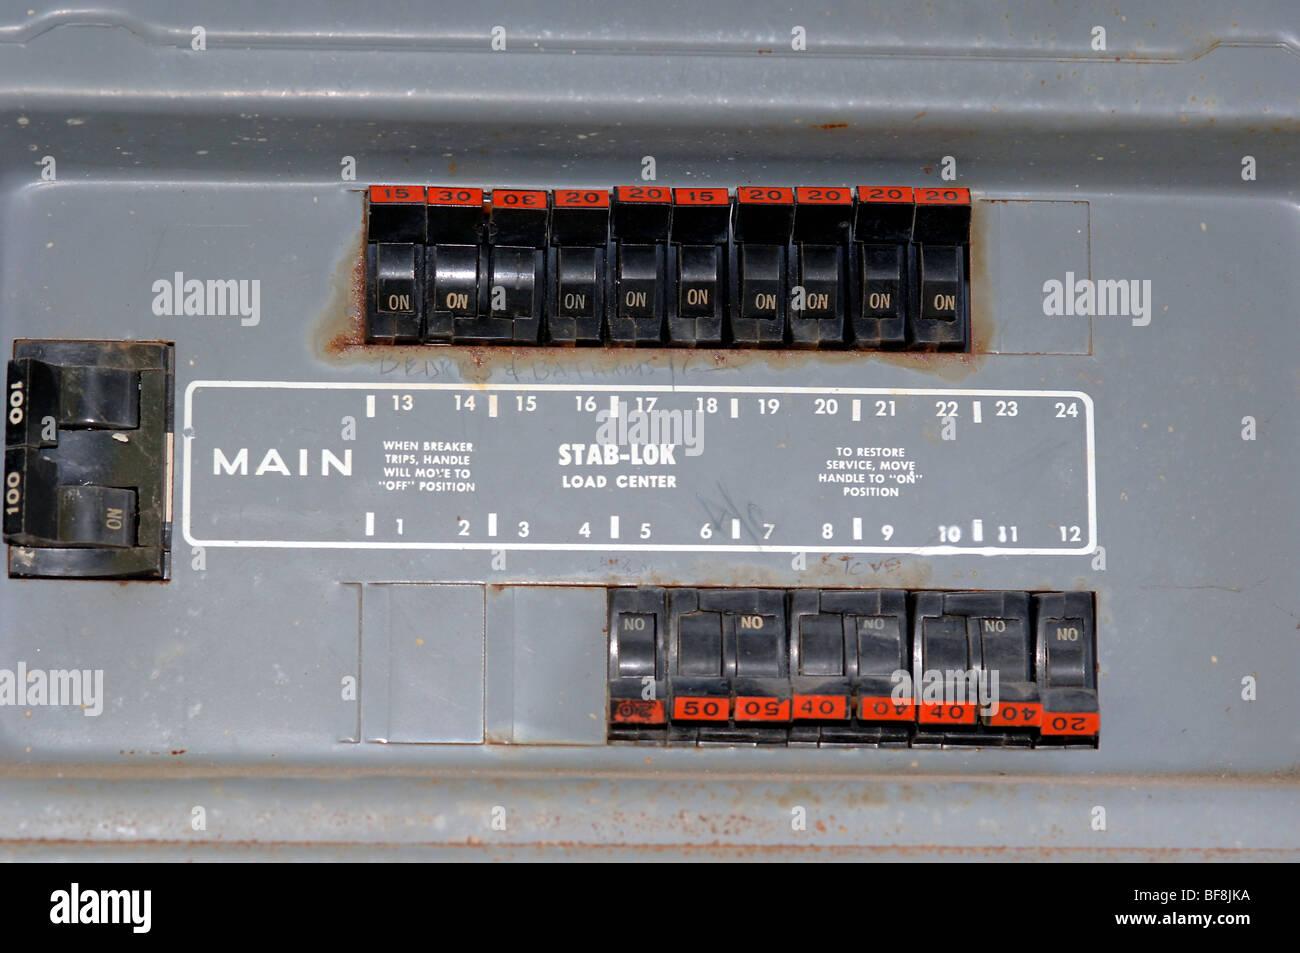 hight resolution of main circuit panel using stab lock breakers in a residential circuit breaker panel